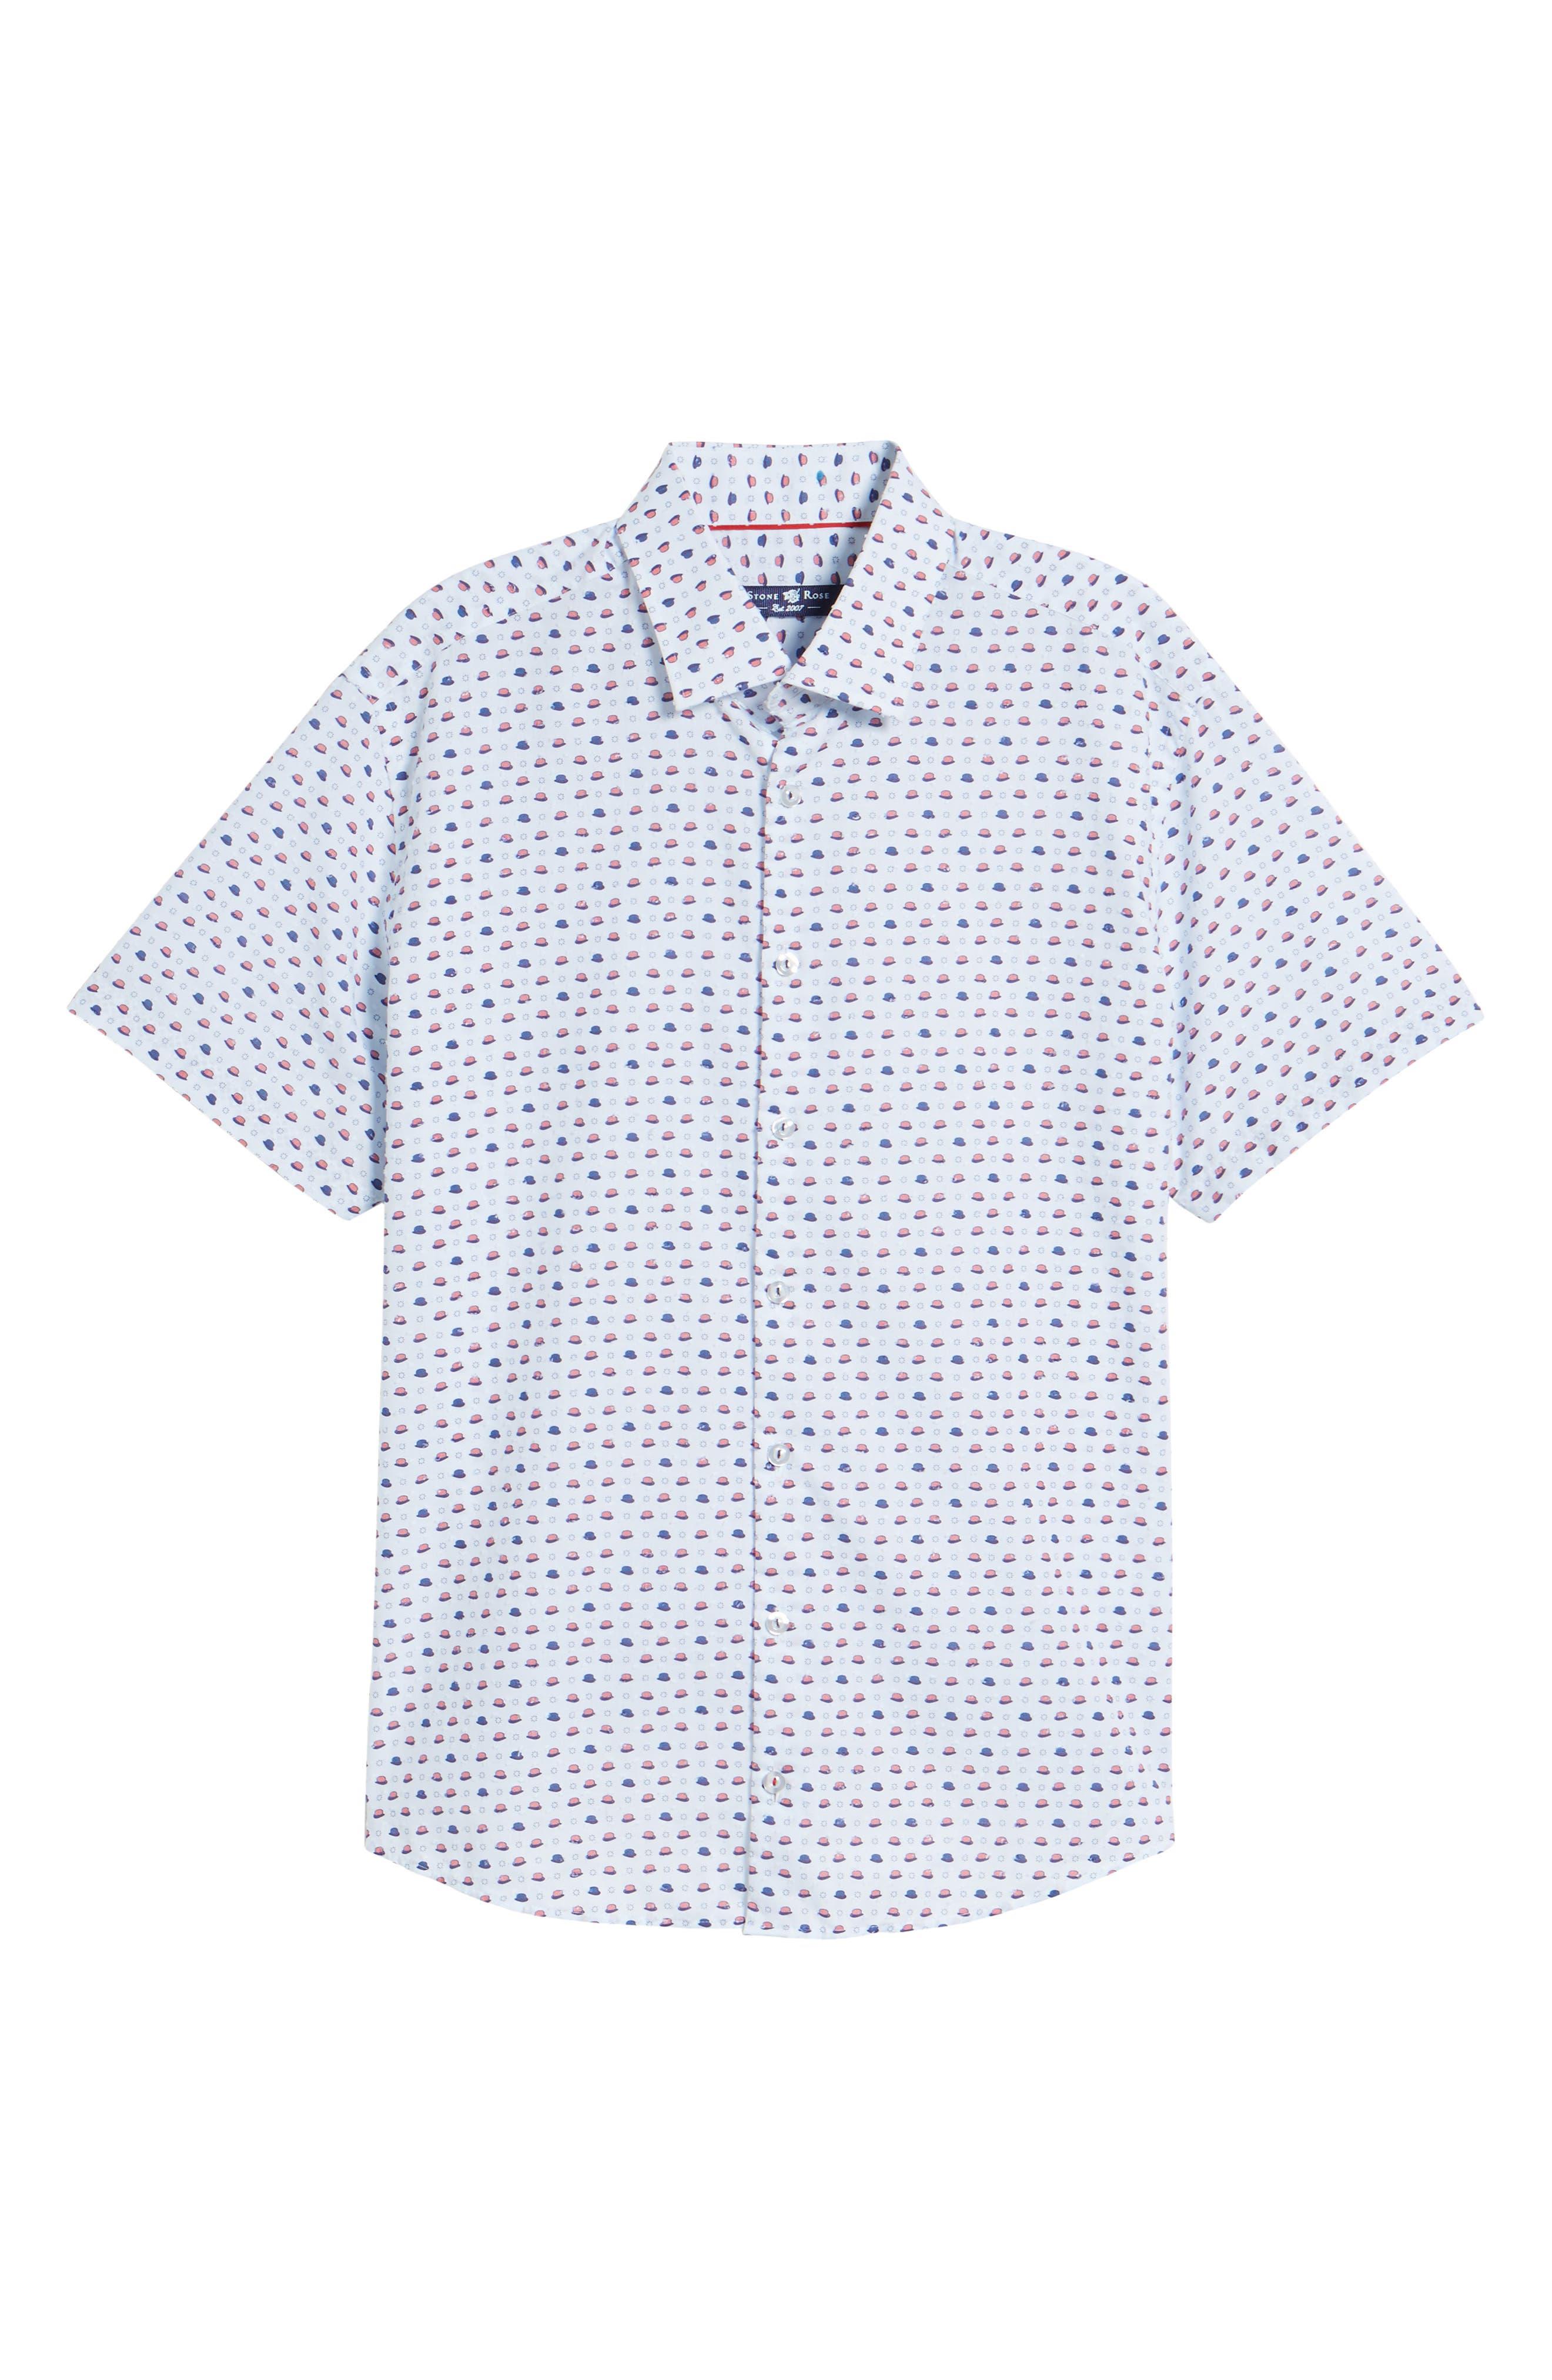 Contemporary Fit Bowler Hat Print Sport Shirt,                             Alternate thumbnail 6, color,                             White